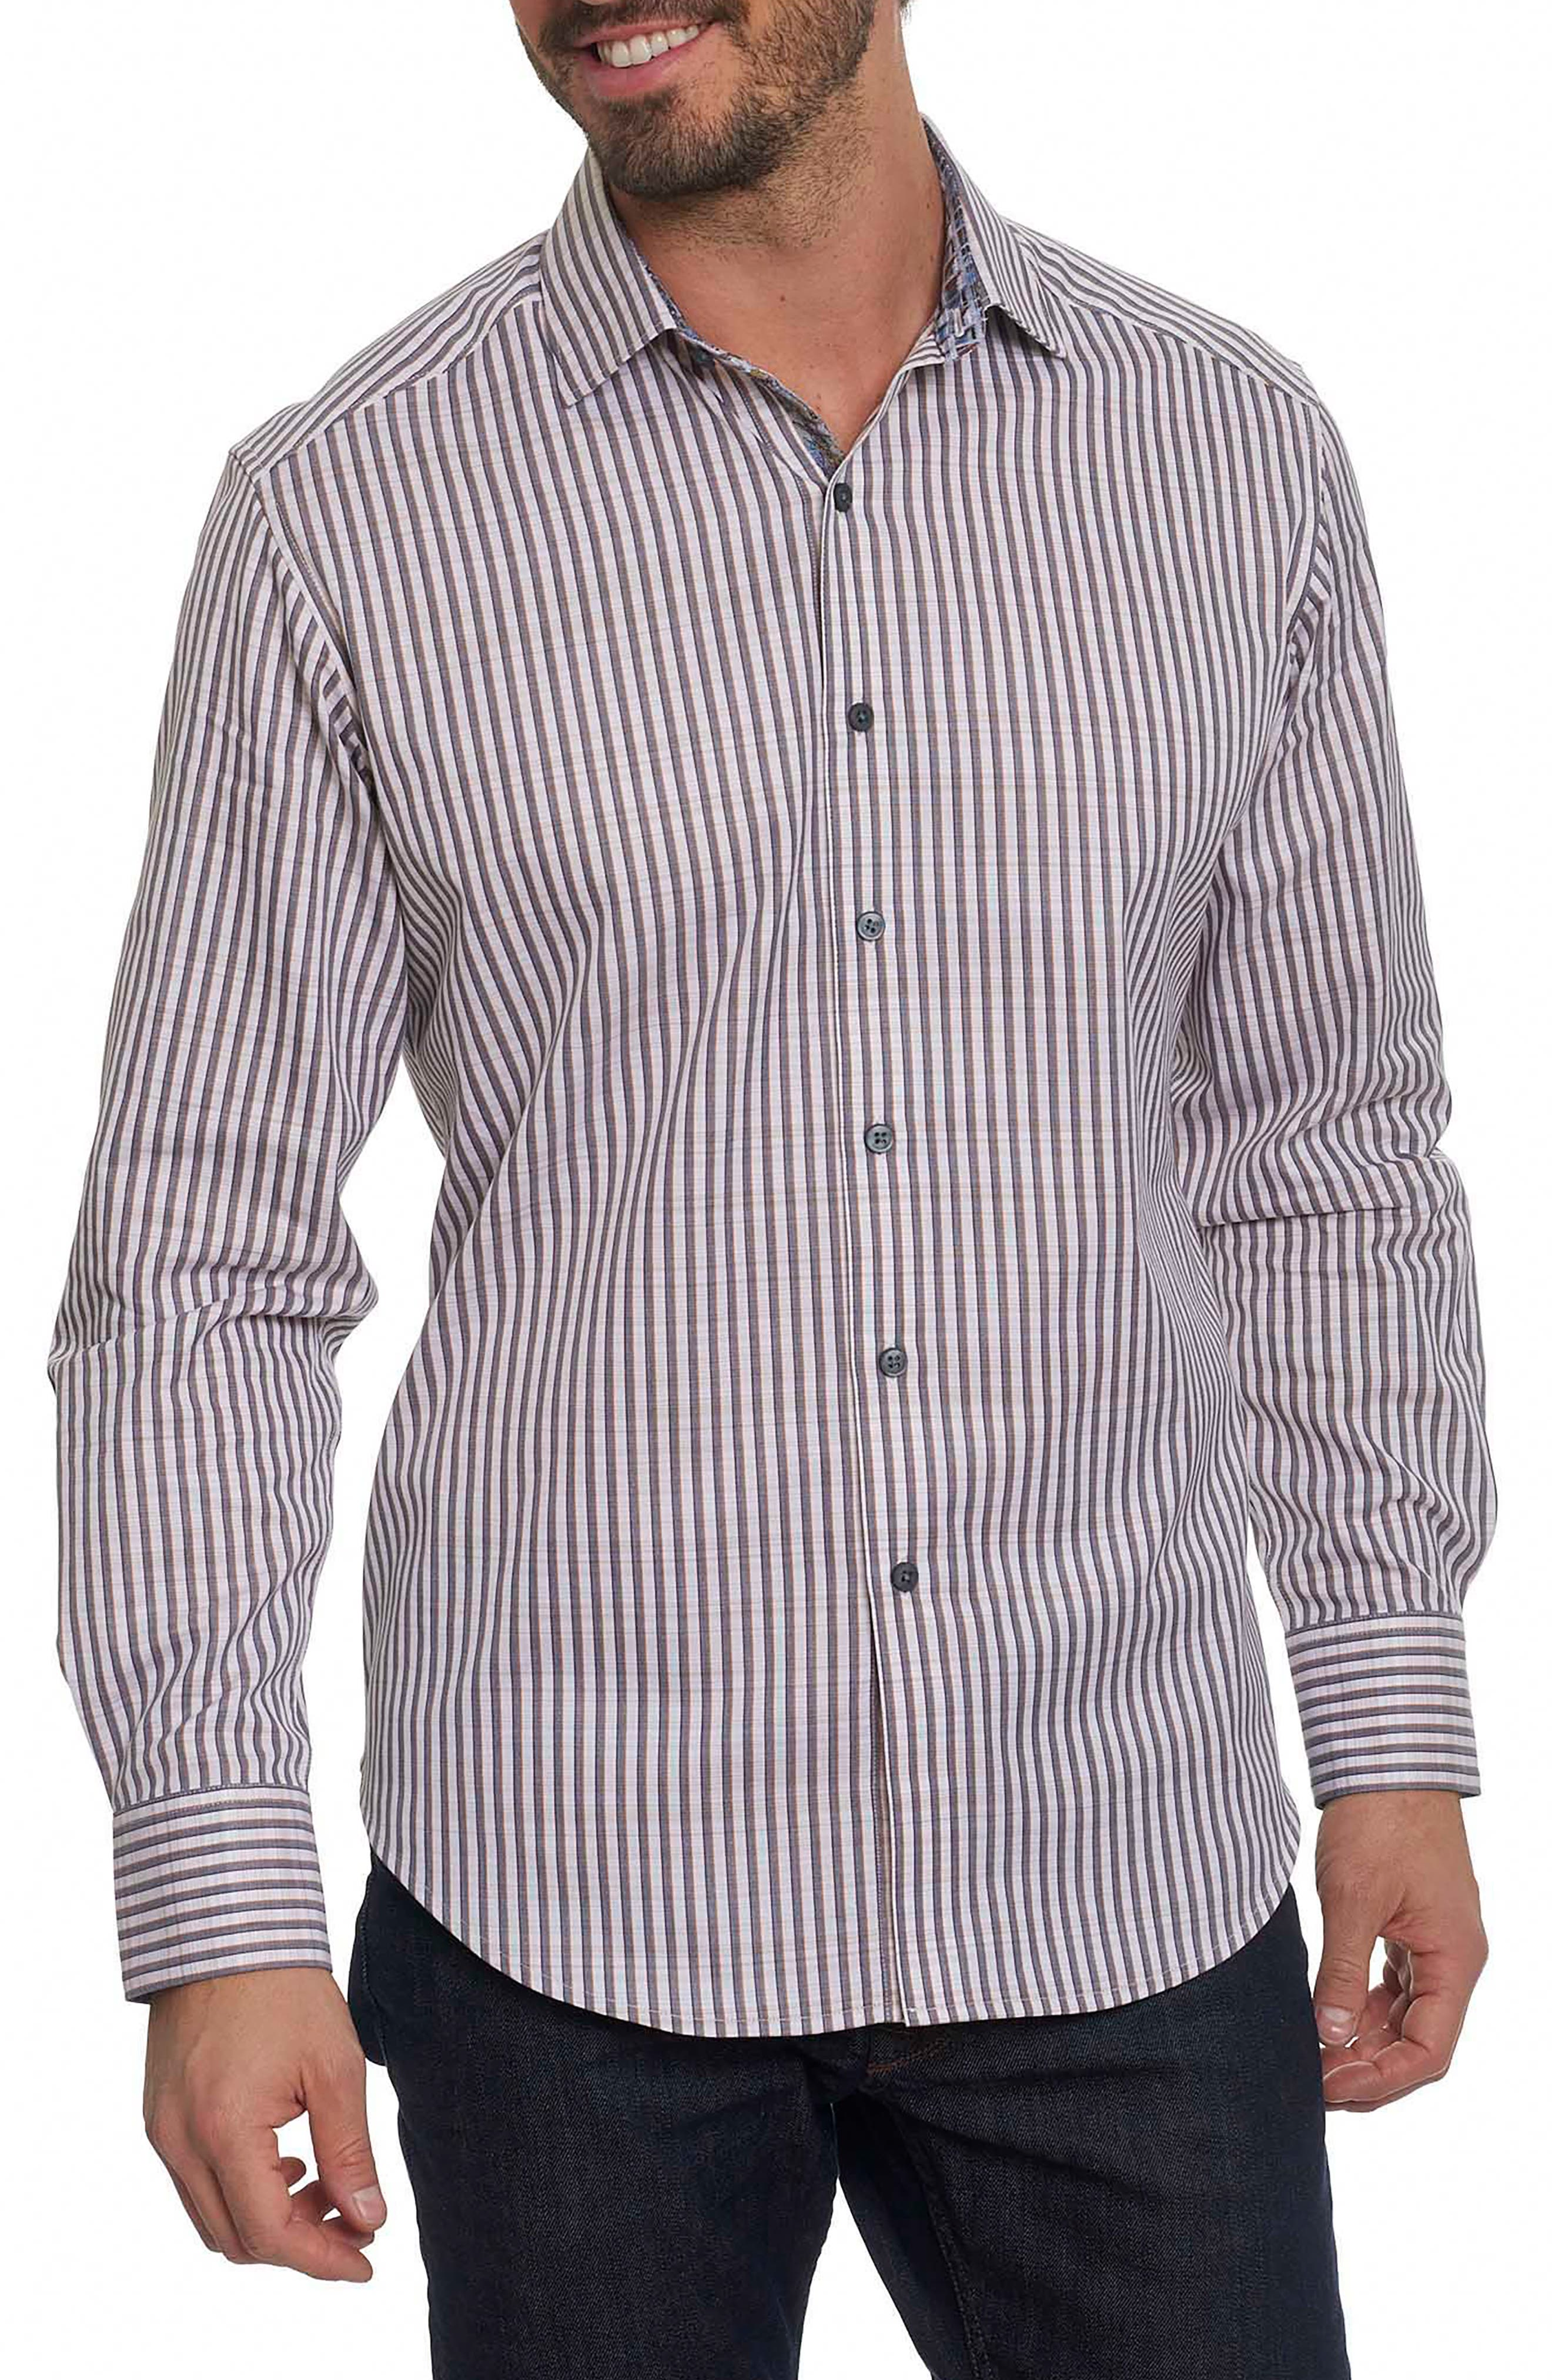 Alternate Image 1 Selected - Robert Graham Marion Classic Fit Stripe Sport Shirt